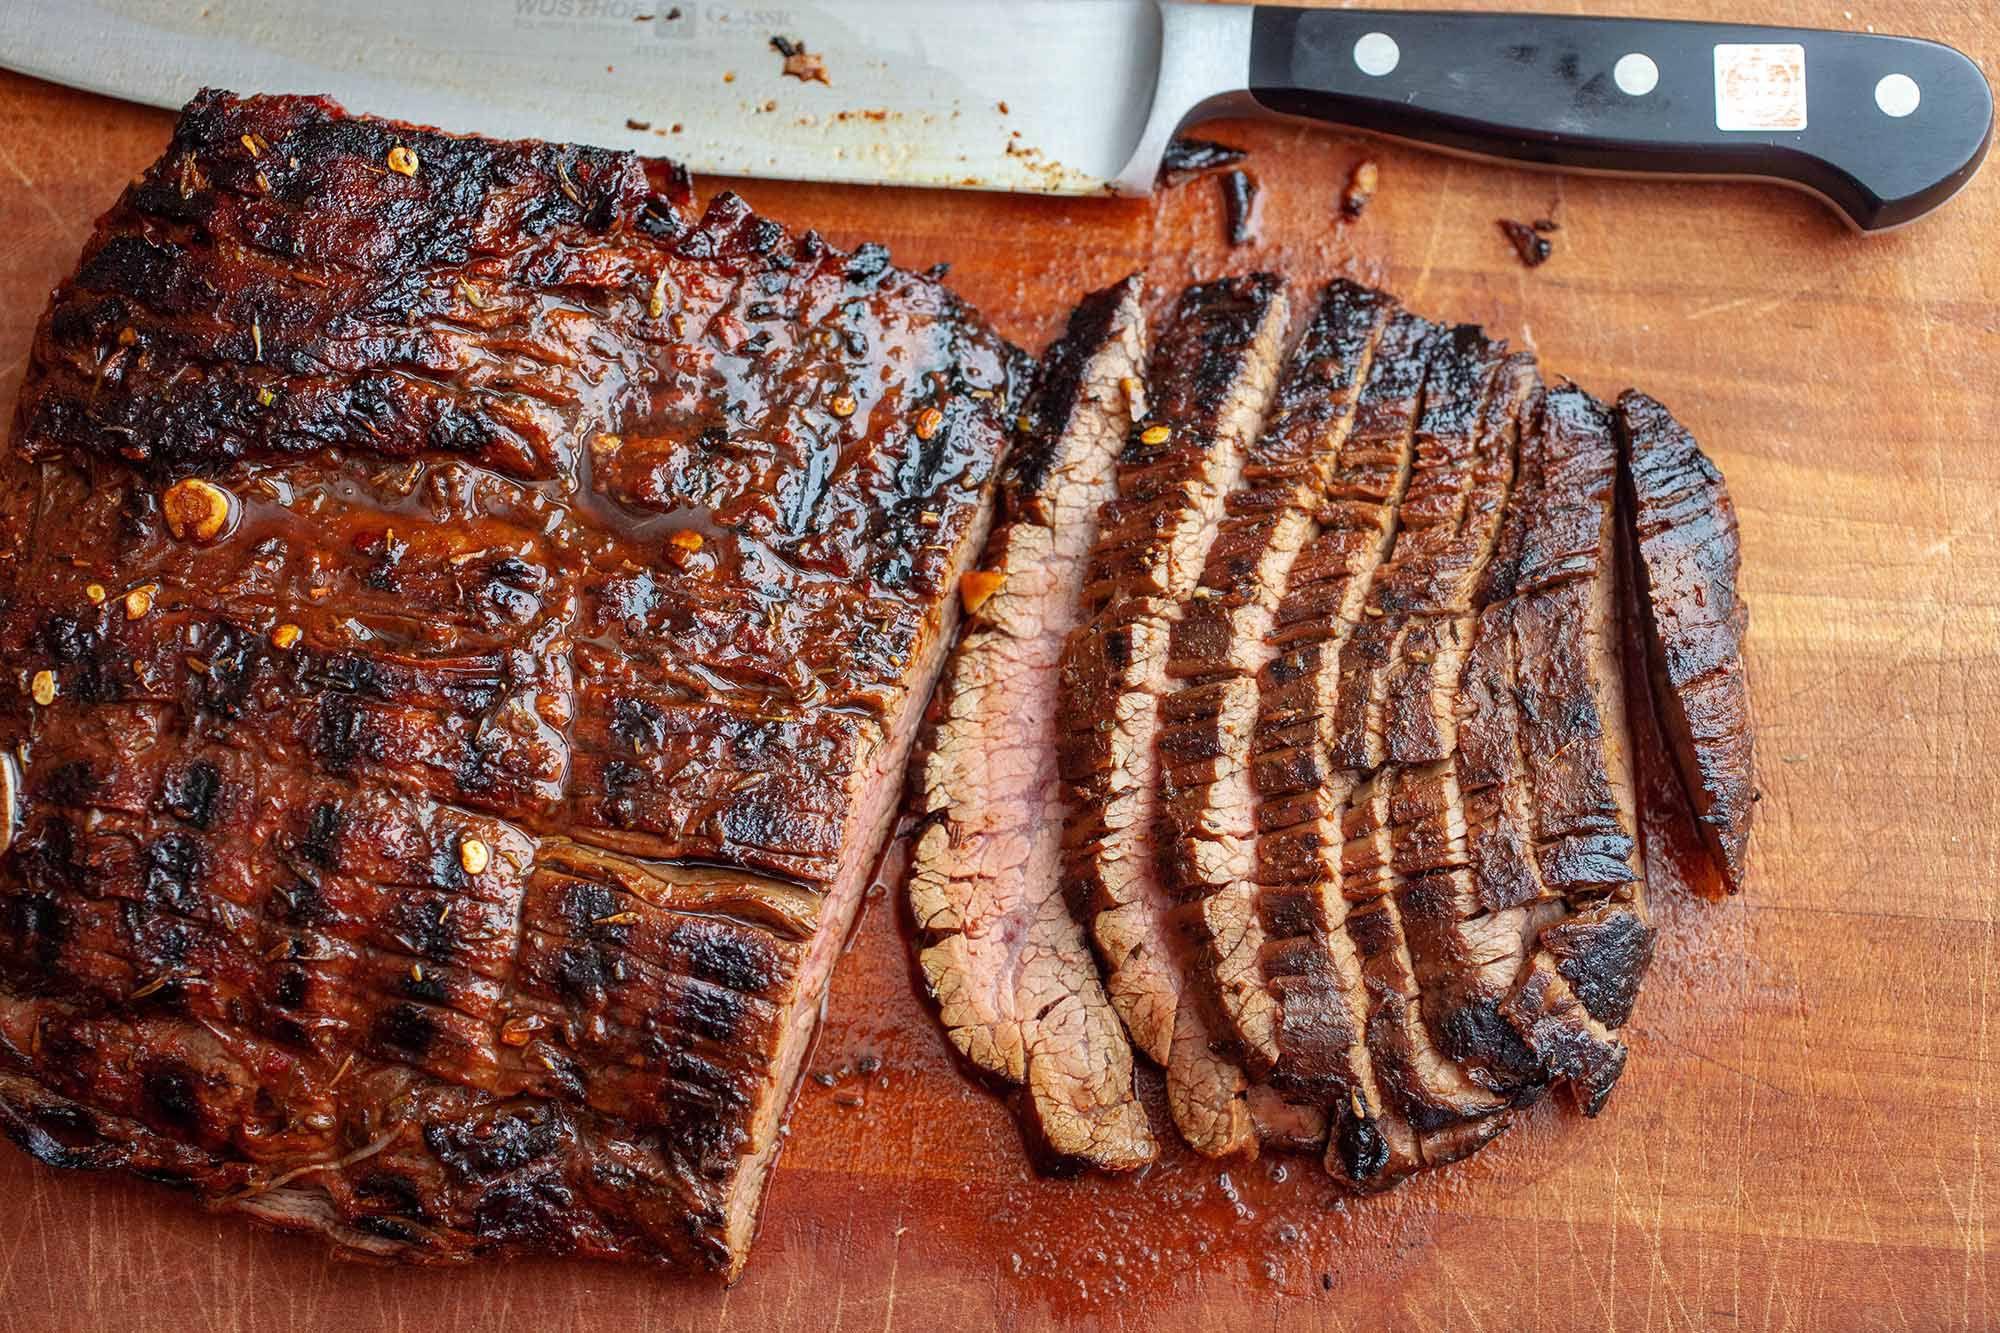 opt aboutcom coeus resources content migration simply recipes uploads 2019 06 Grilled Flank Steak LEAD 1 93743d42c7cc48fca120140a0da38673